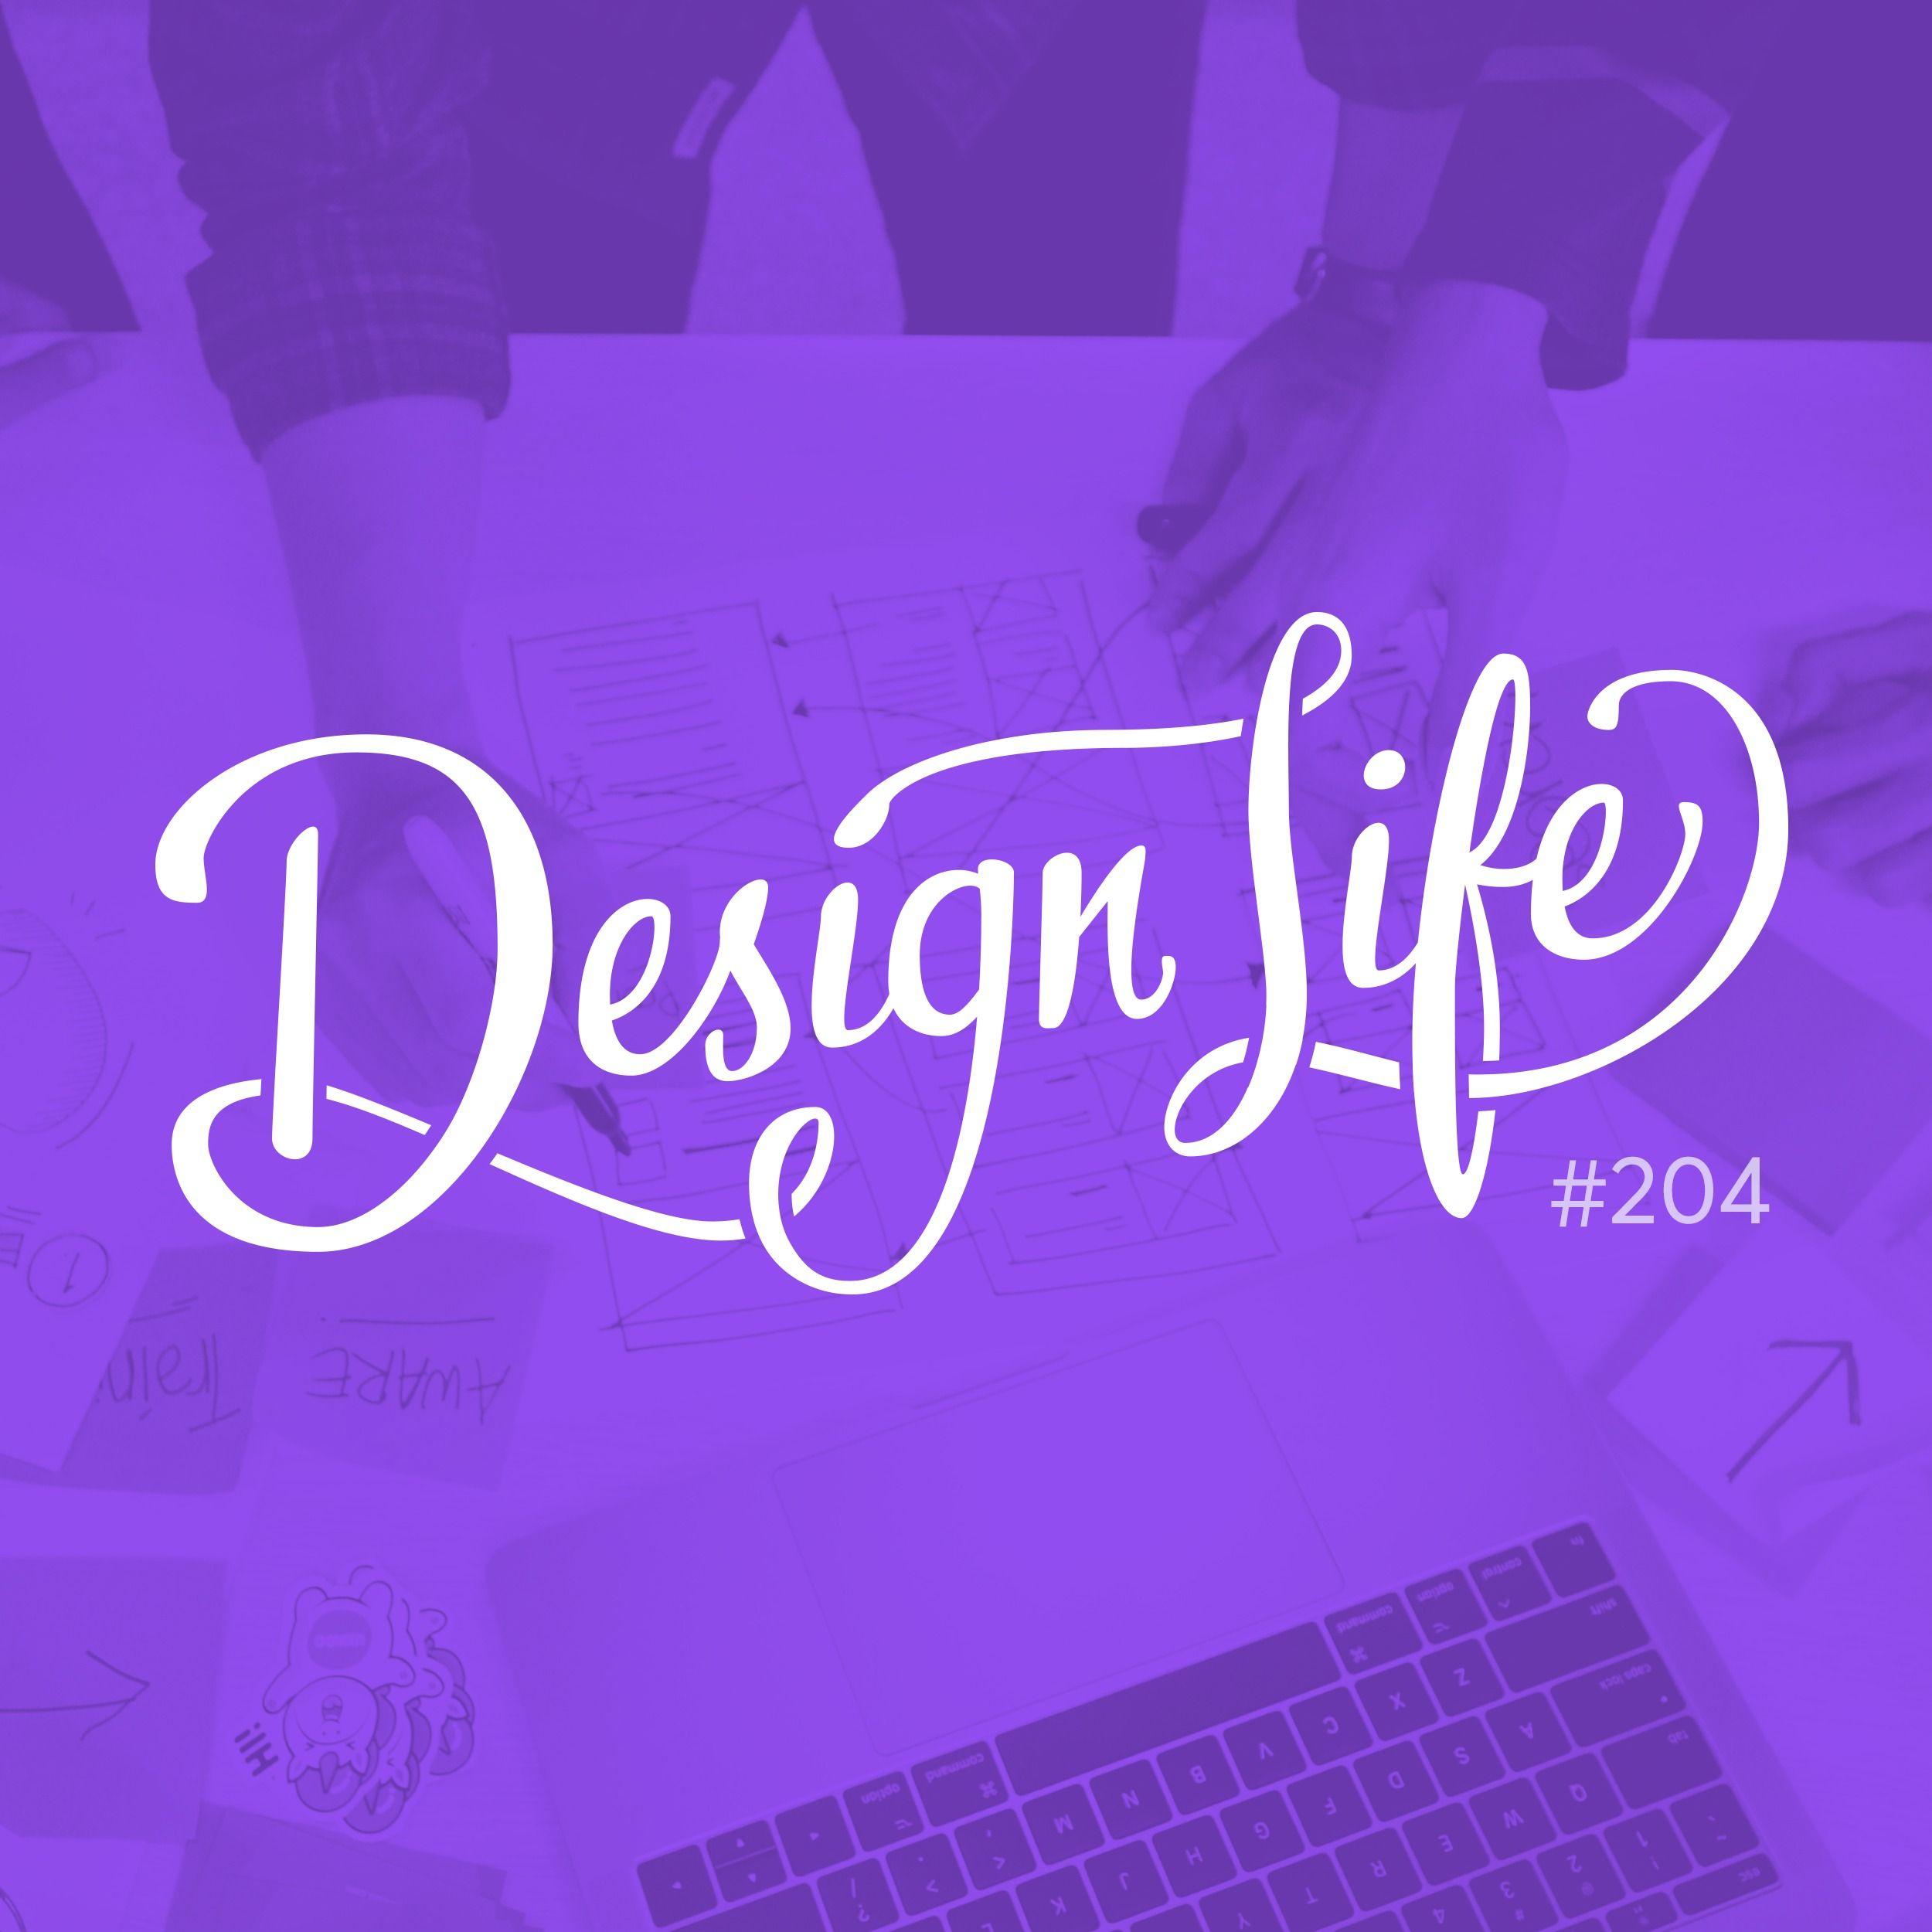 204: Speeding up the design process